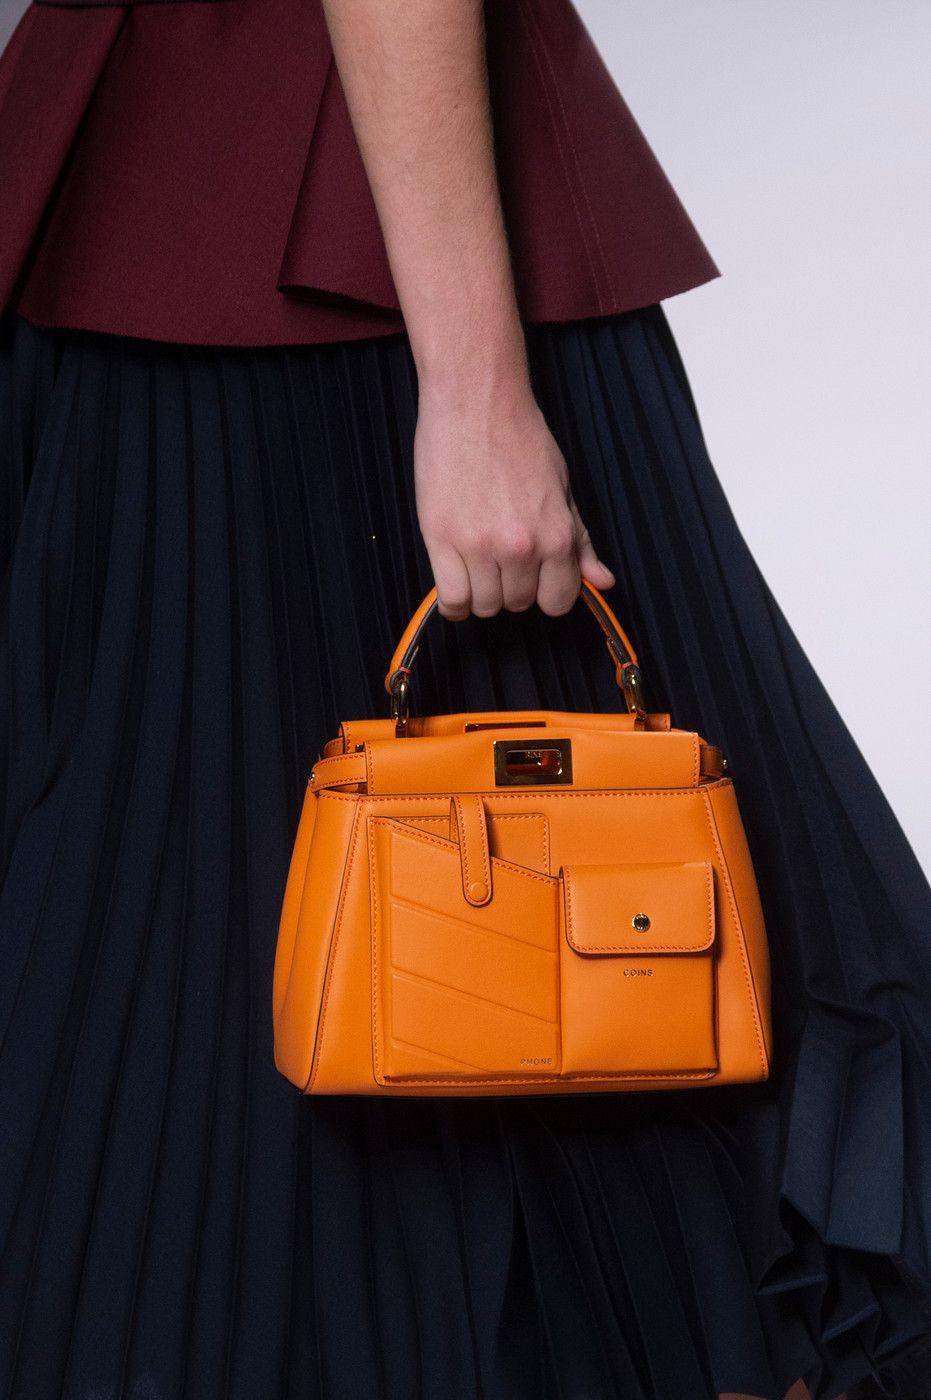 Fendi at Milan Fashion Week Spring 2019 - Details Runway Photos 5e3ef6a8b4c2b